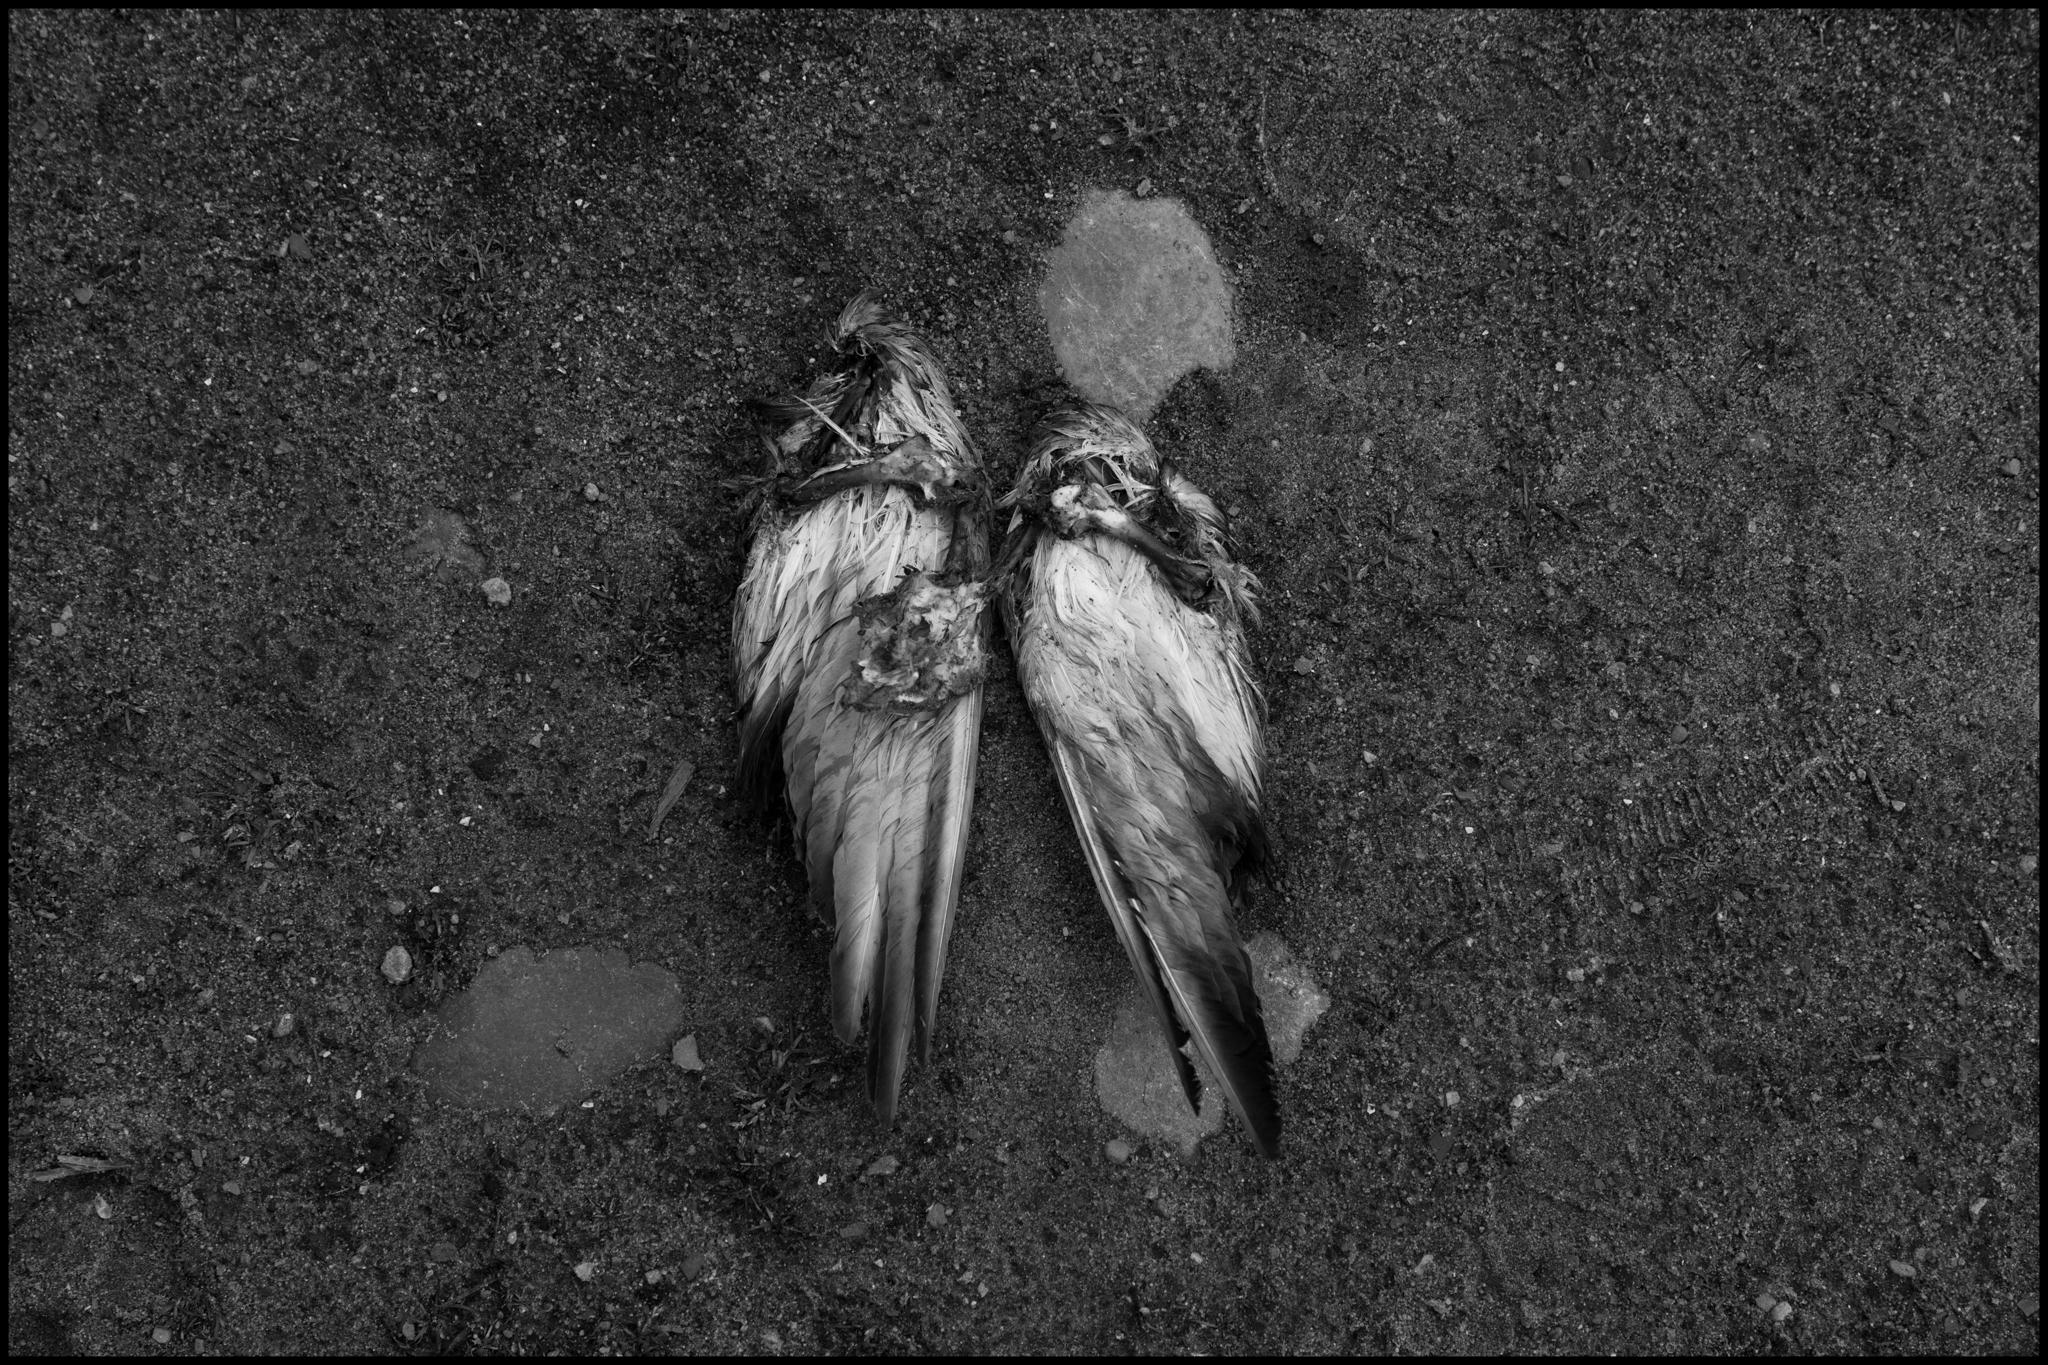 8 May 2019 - Bird carcass, Manchester UK